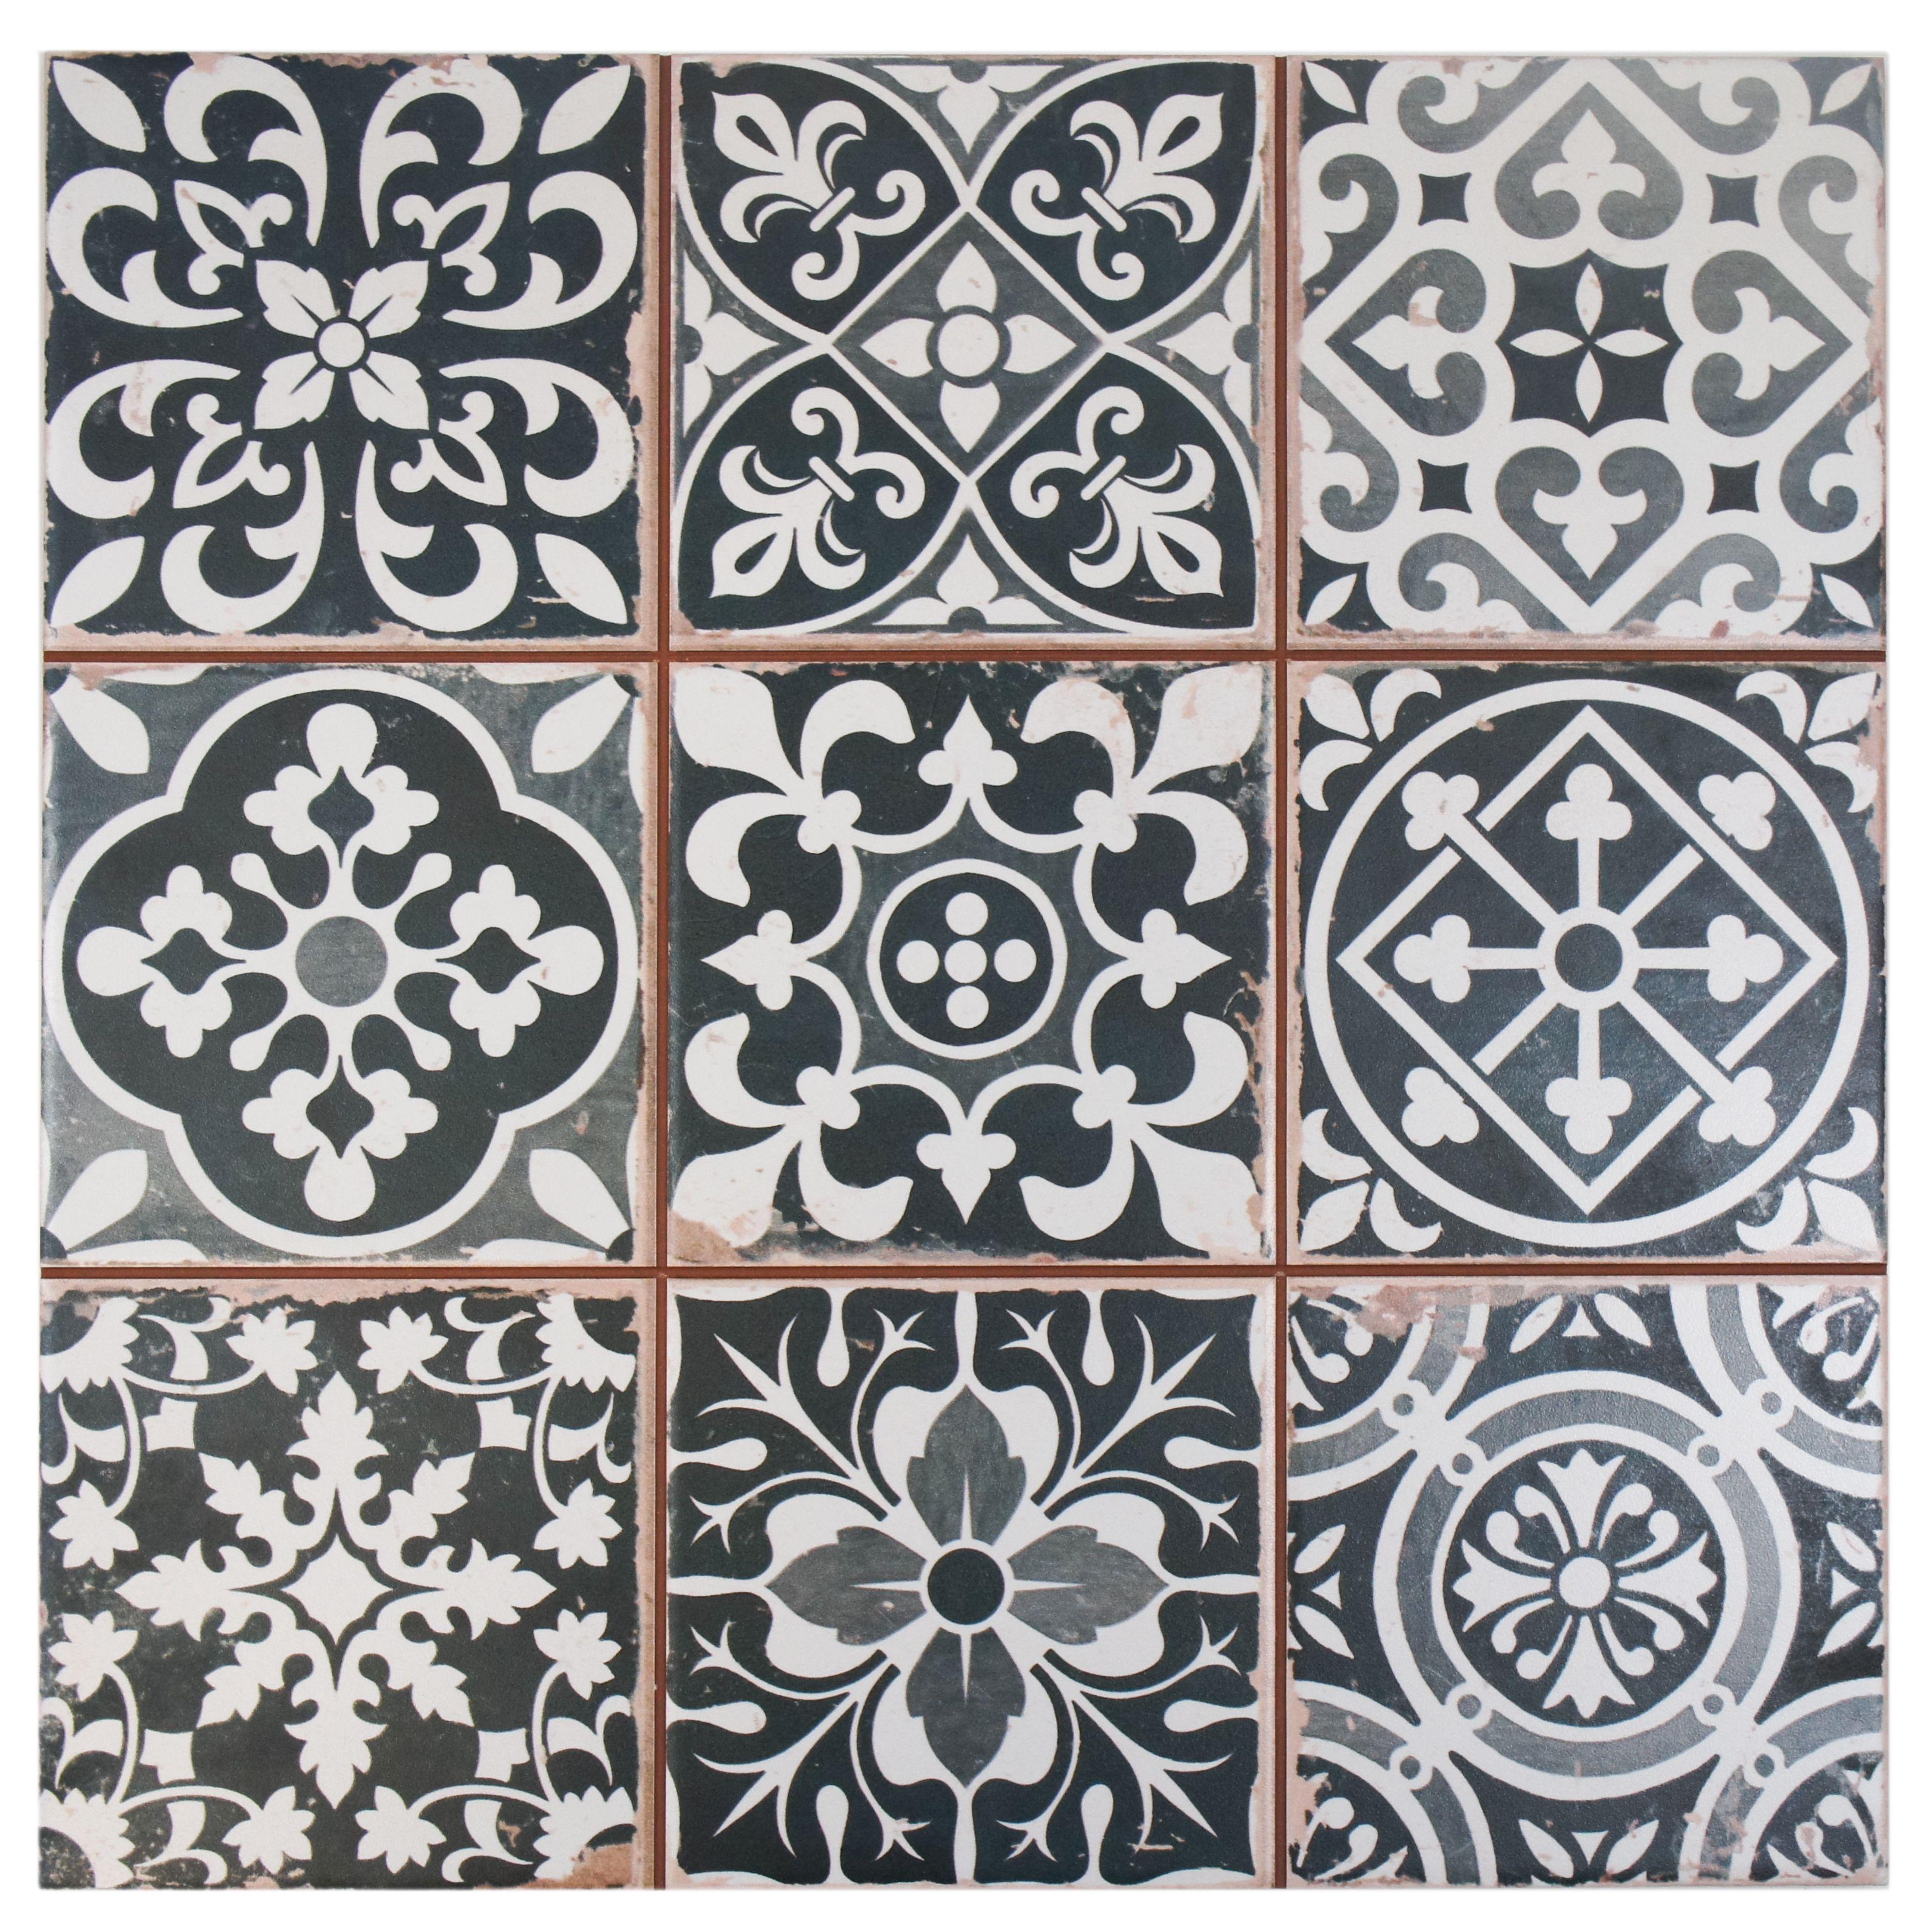 Somertile 13x13 inch faventia nero ceramic floor and wall for Carrelage motif retro